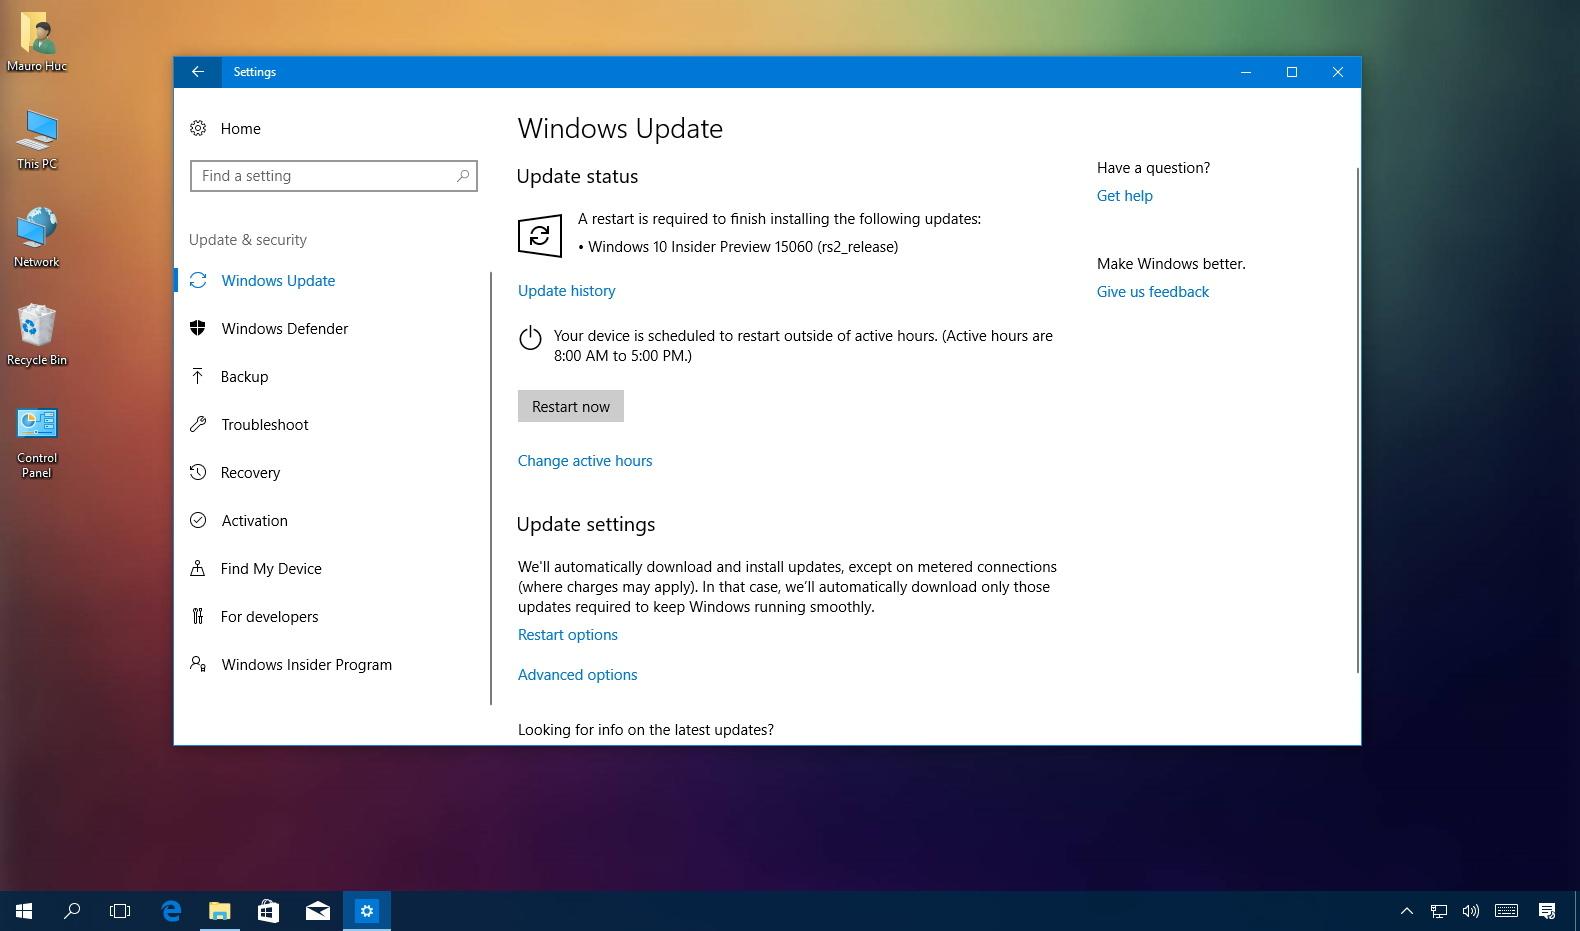 Windows 10 build 15060